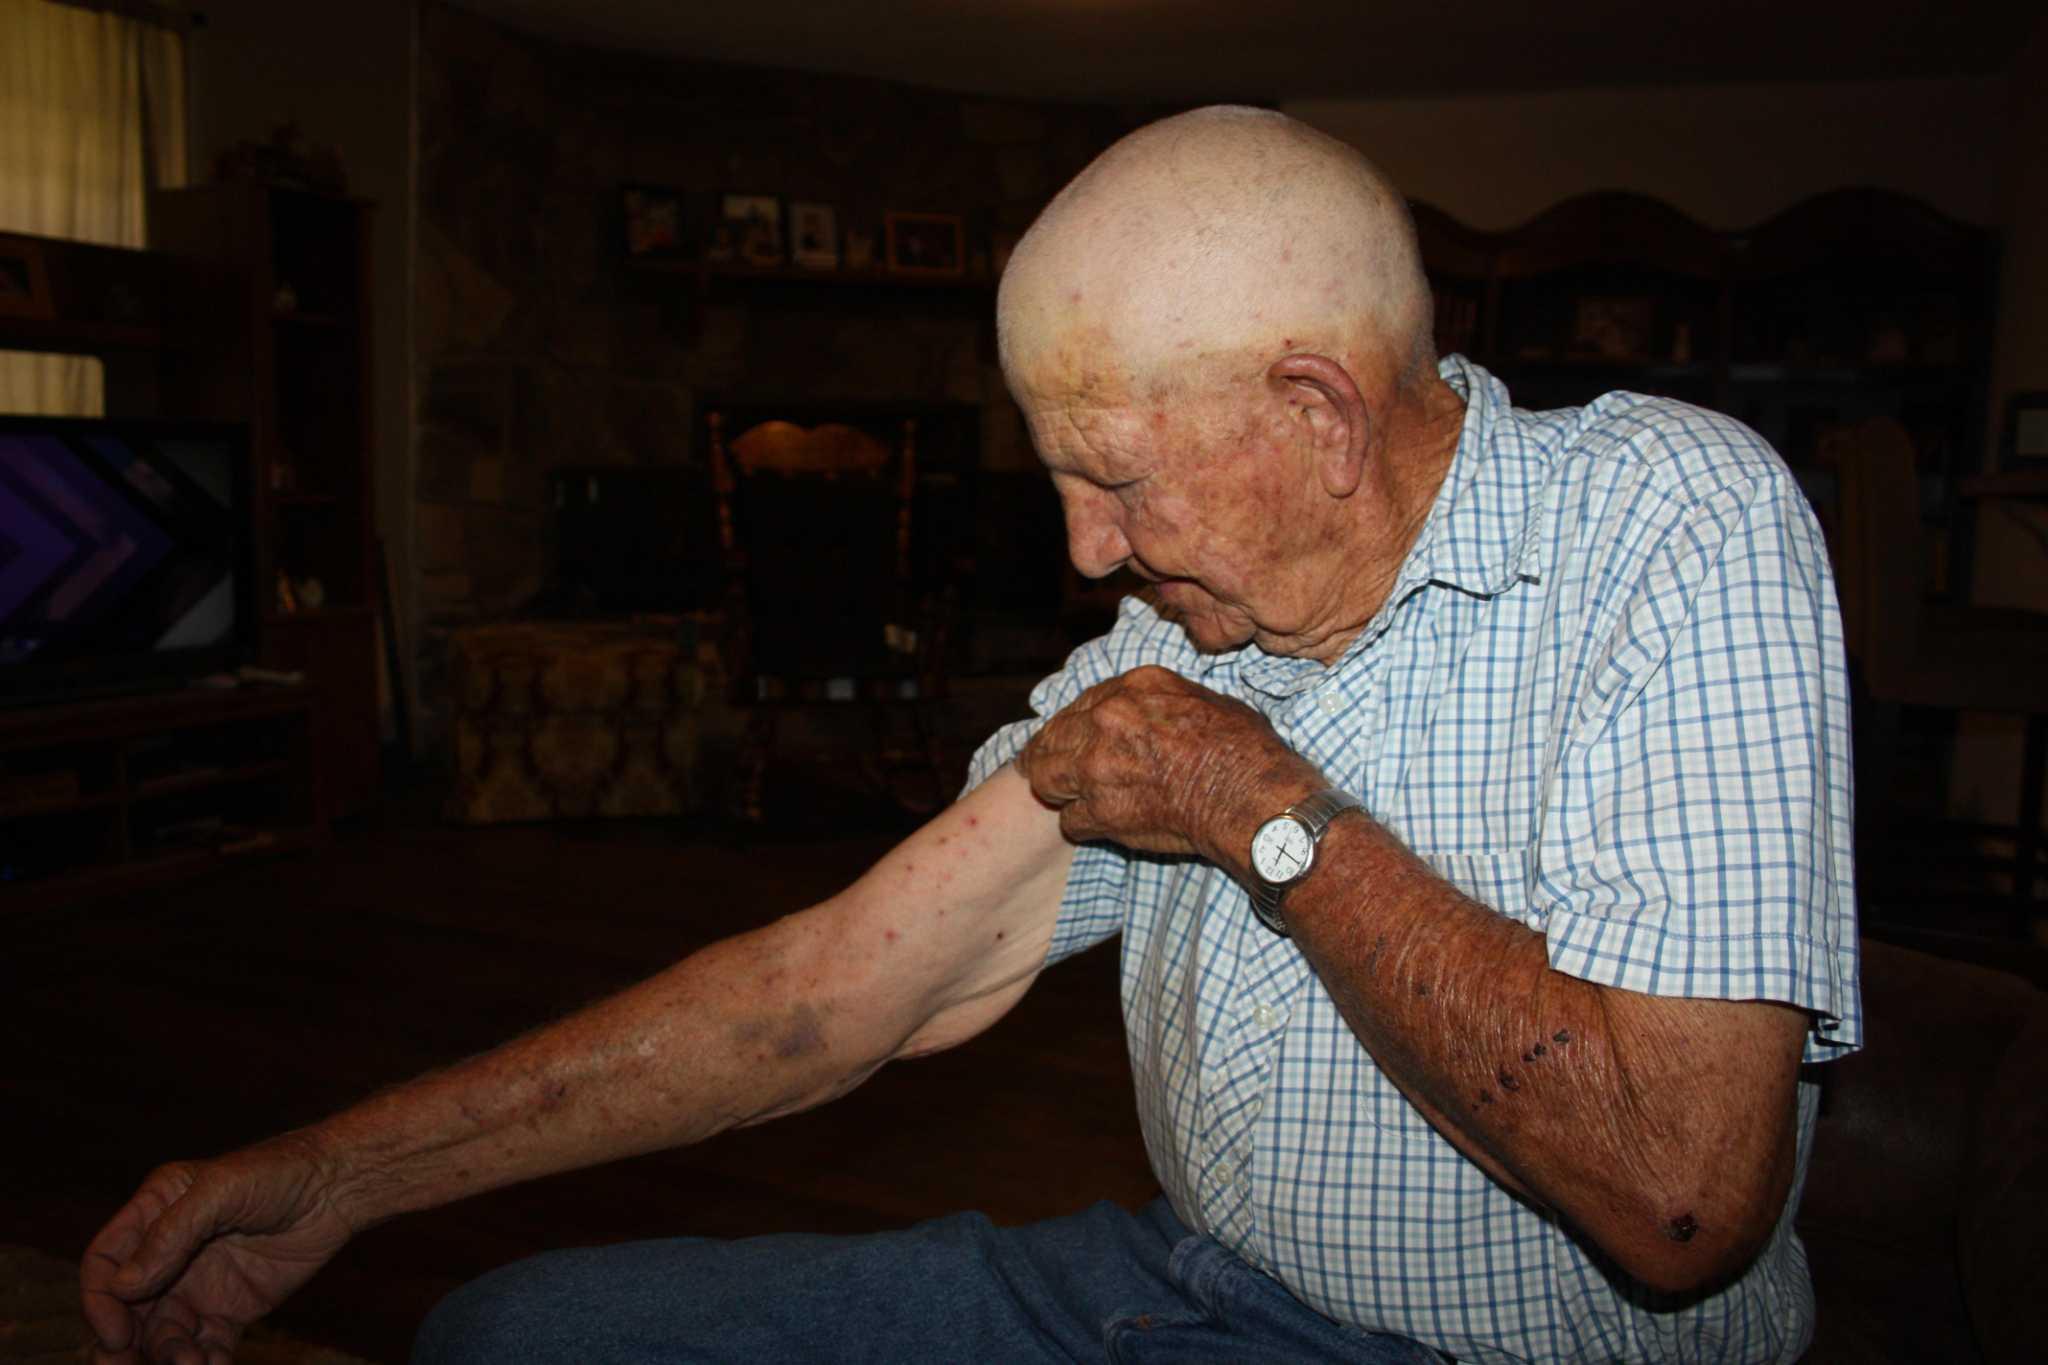 Tarkington man survives aggressive bee attack - Houston Chronicle